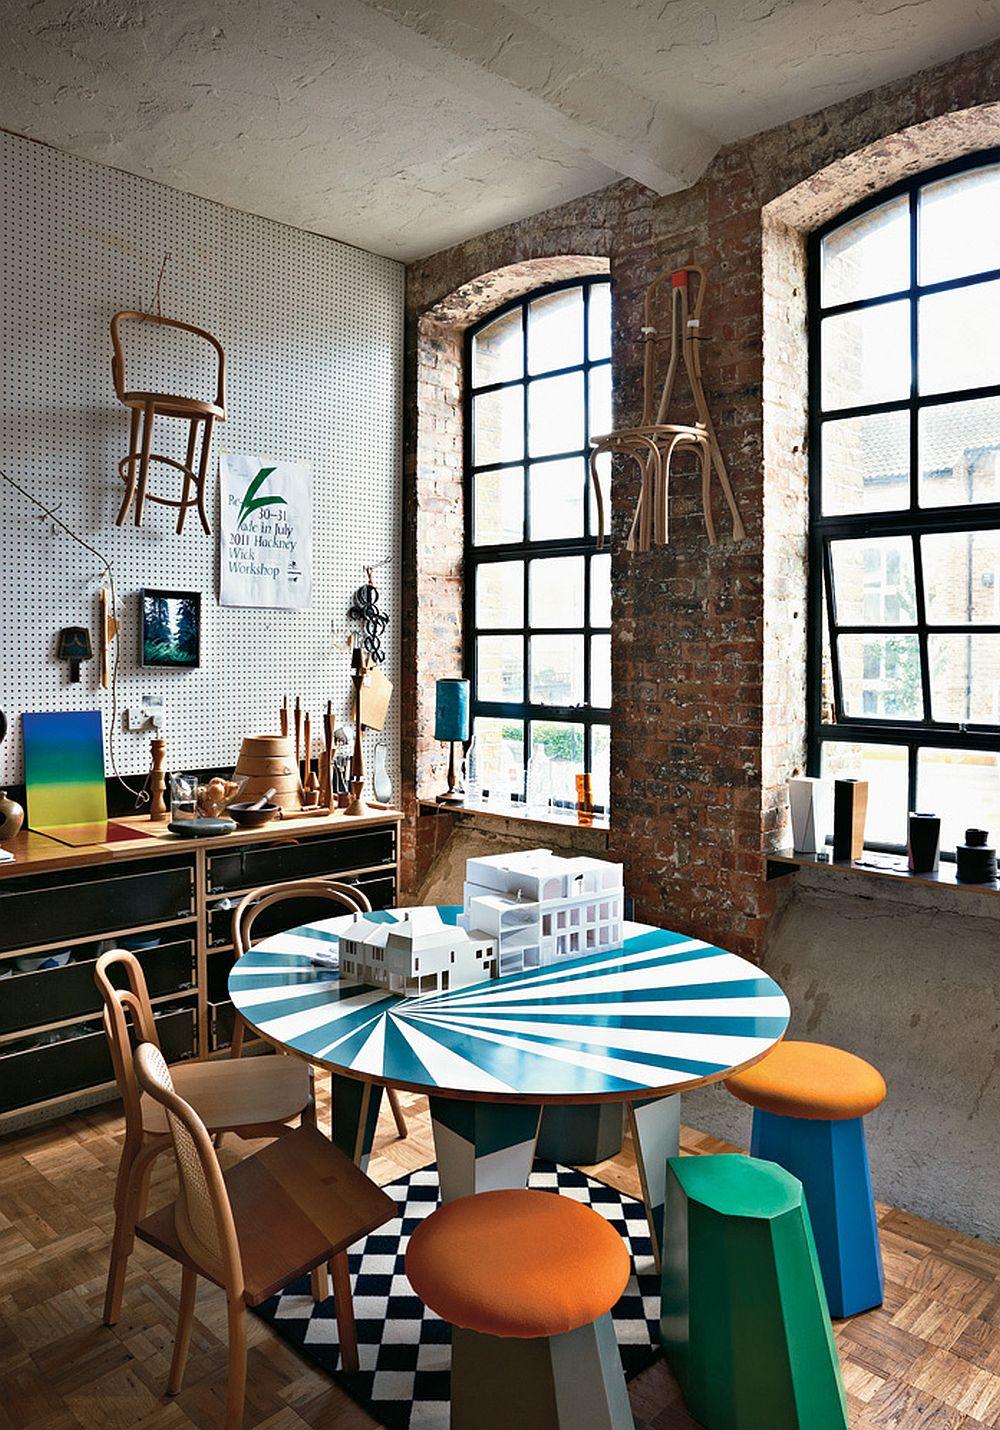 adelaparvu.com despre locuinta de artisti, apartament Londra, designeri Martino Gamper si Francis Upritchard, Foto Tom Mannion (12)